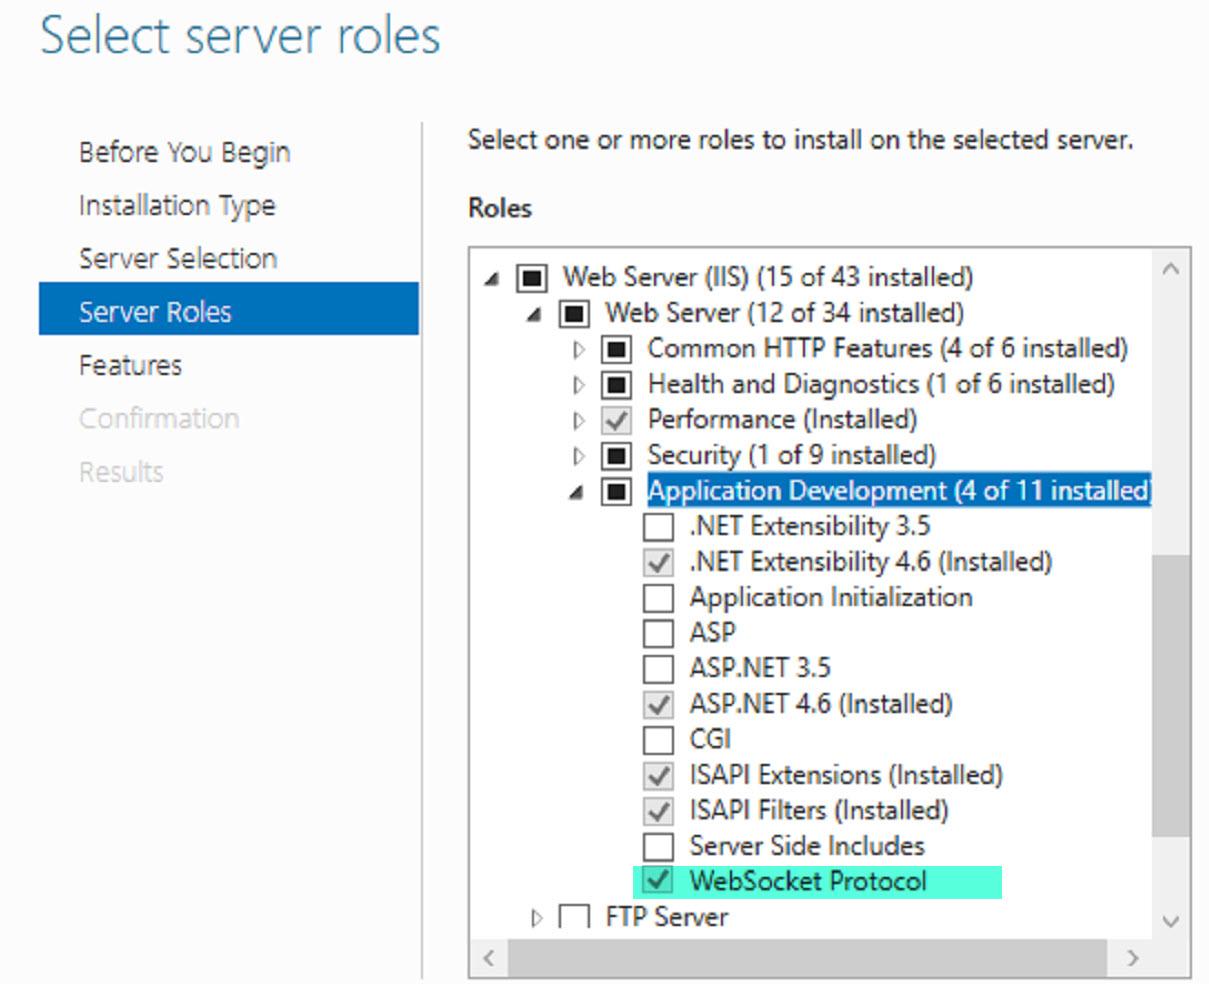 Add Server Role: WebSocket Protocol